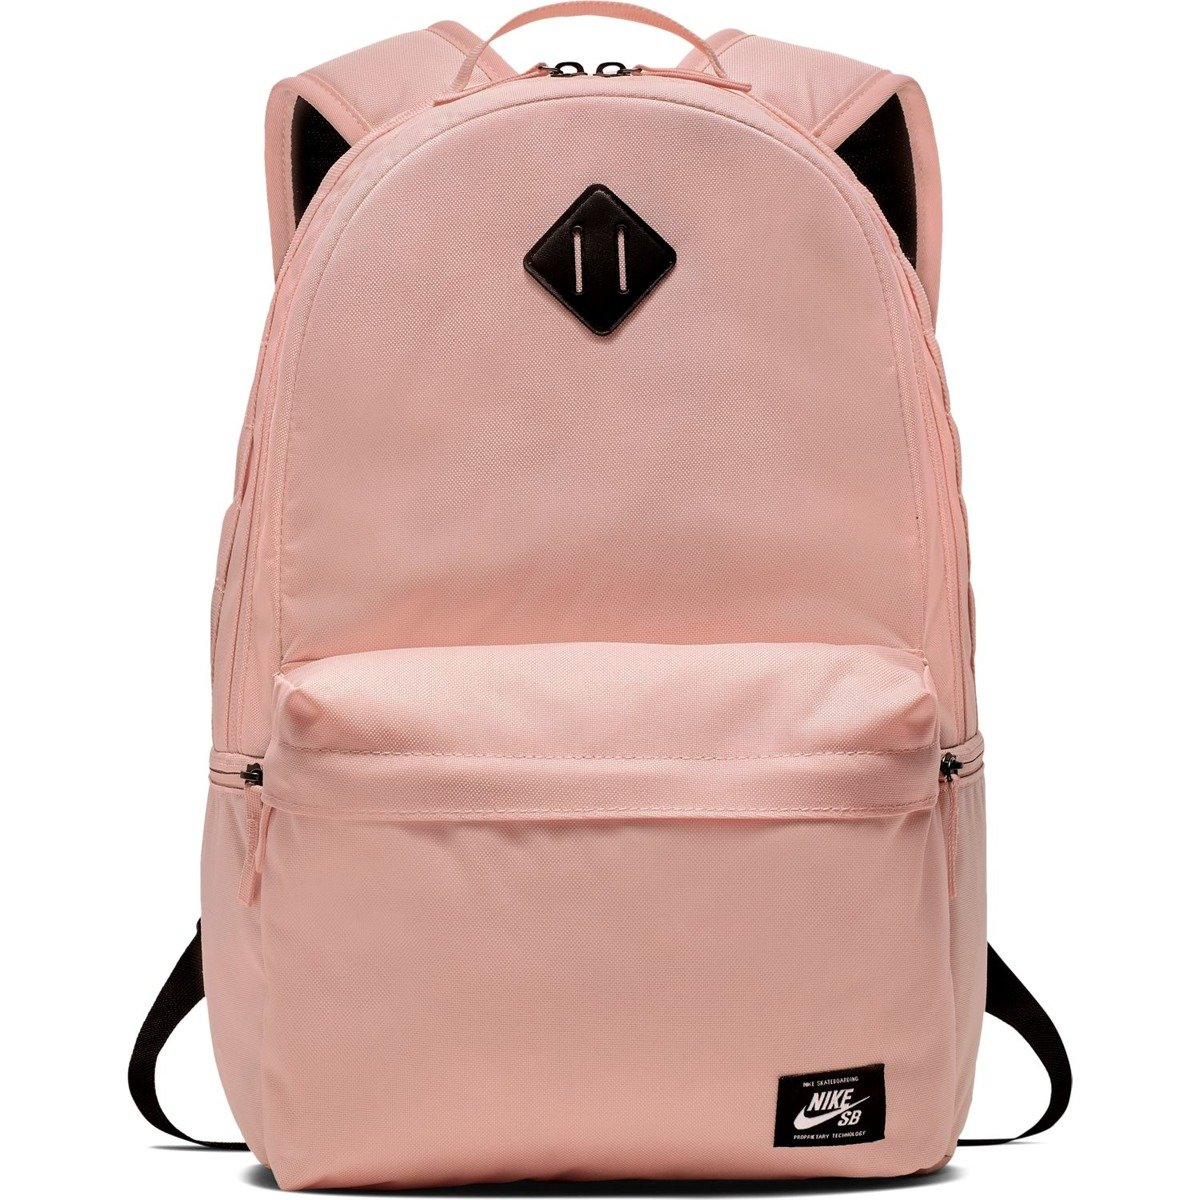 periodista botella Comparable  Nike SB Icon Backpack storm pink/obsidian | Accesories \ Backpacks Brands \ Nike  SB | Skateshop Miniramp.pl